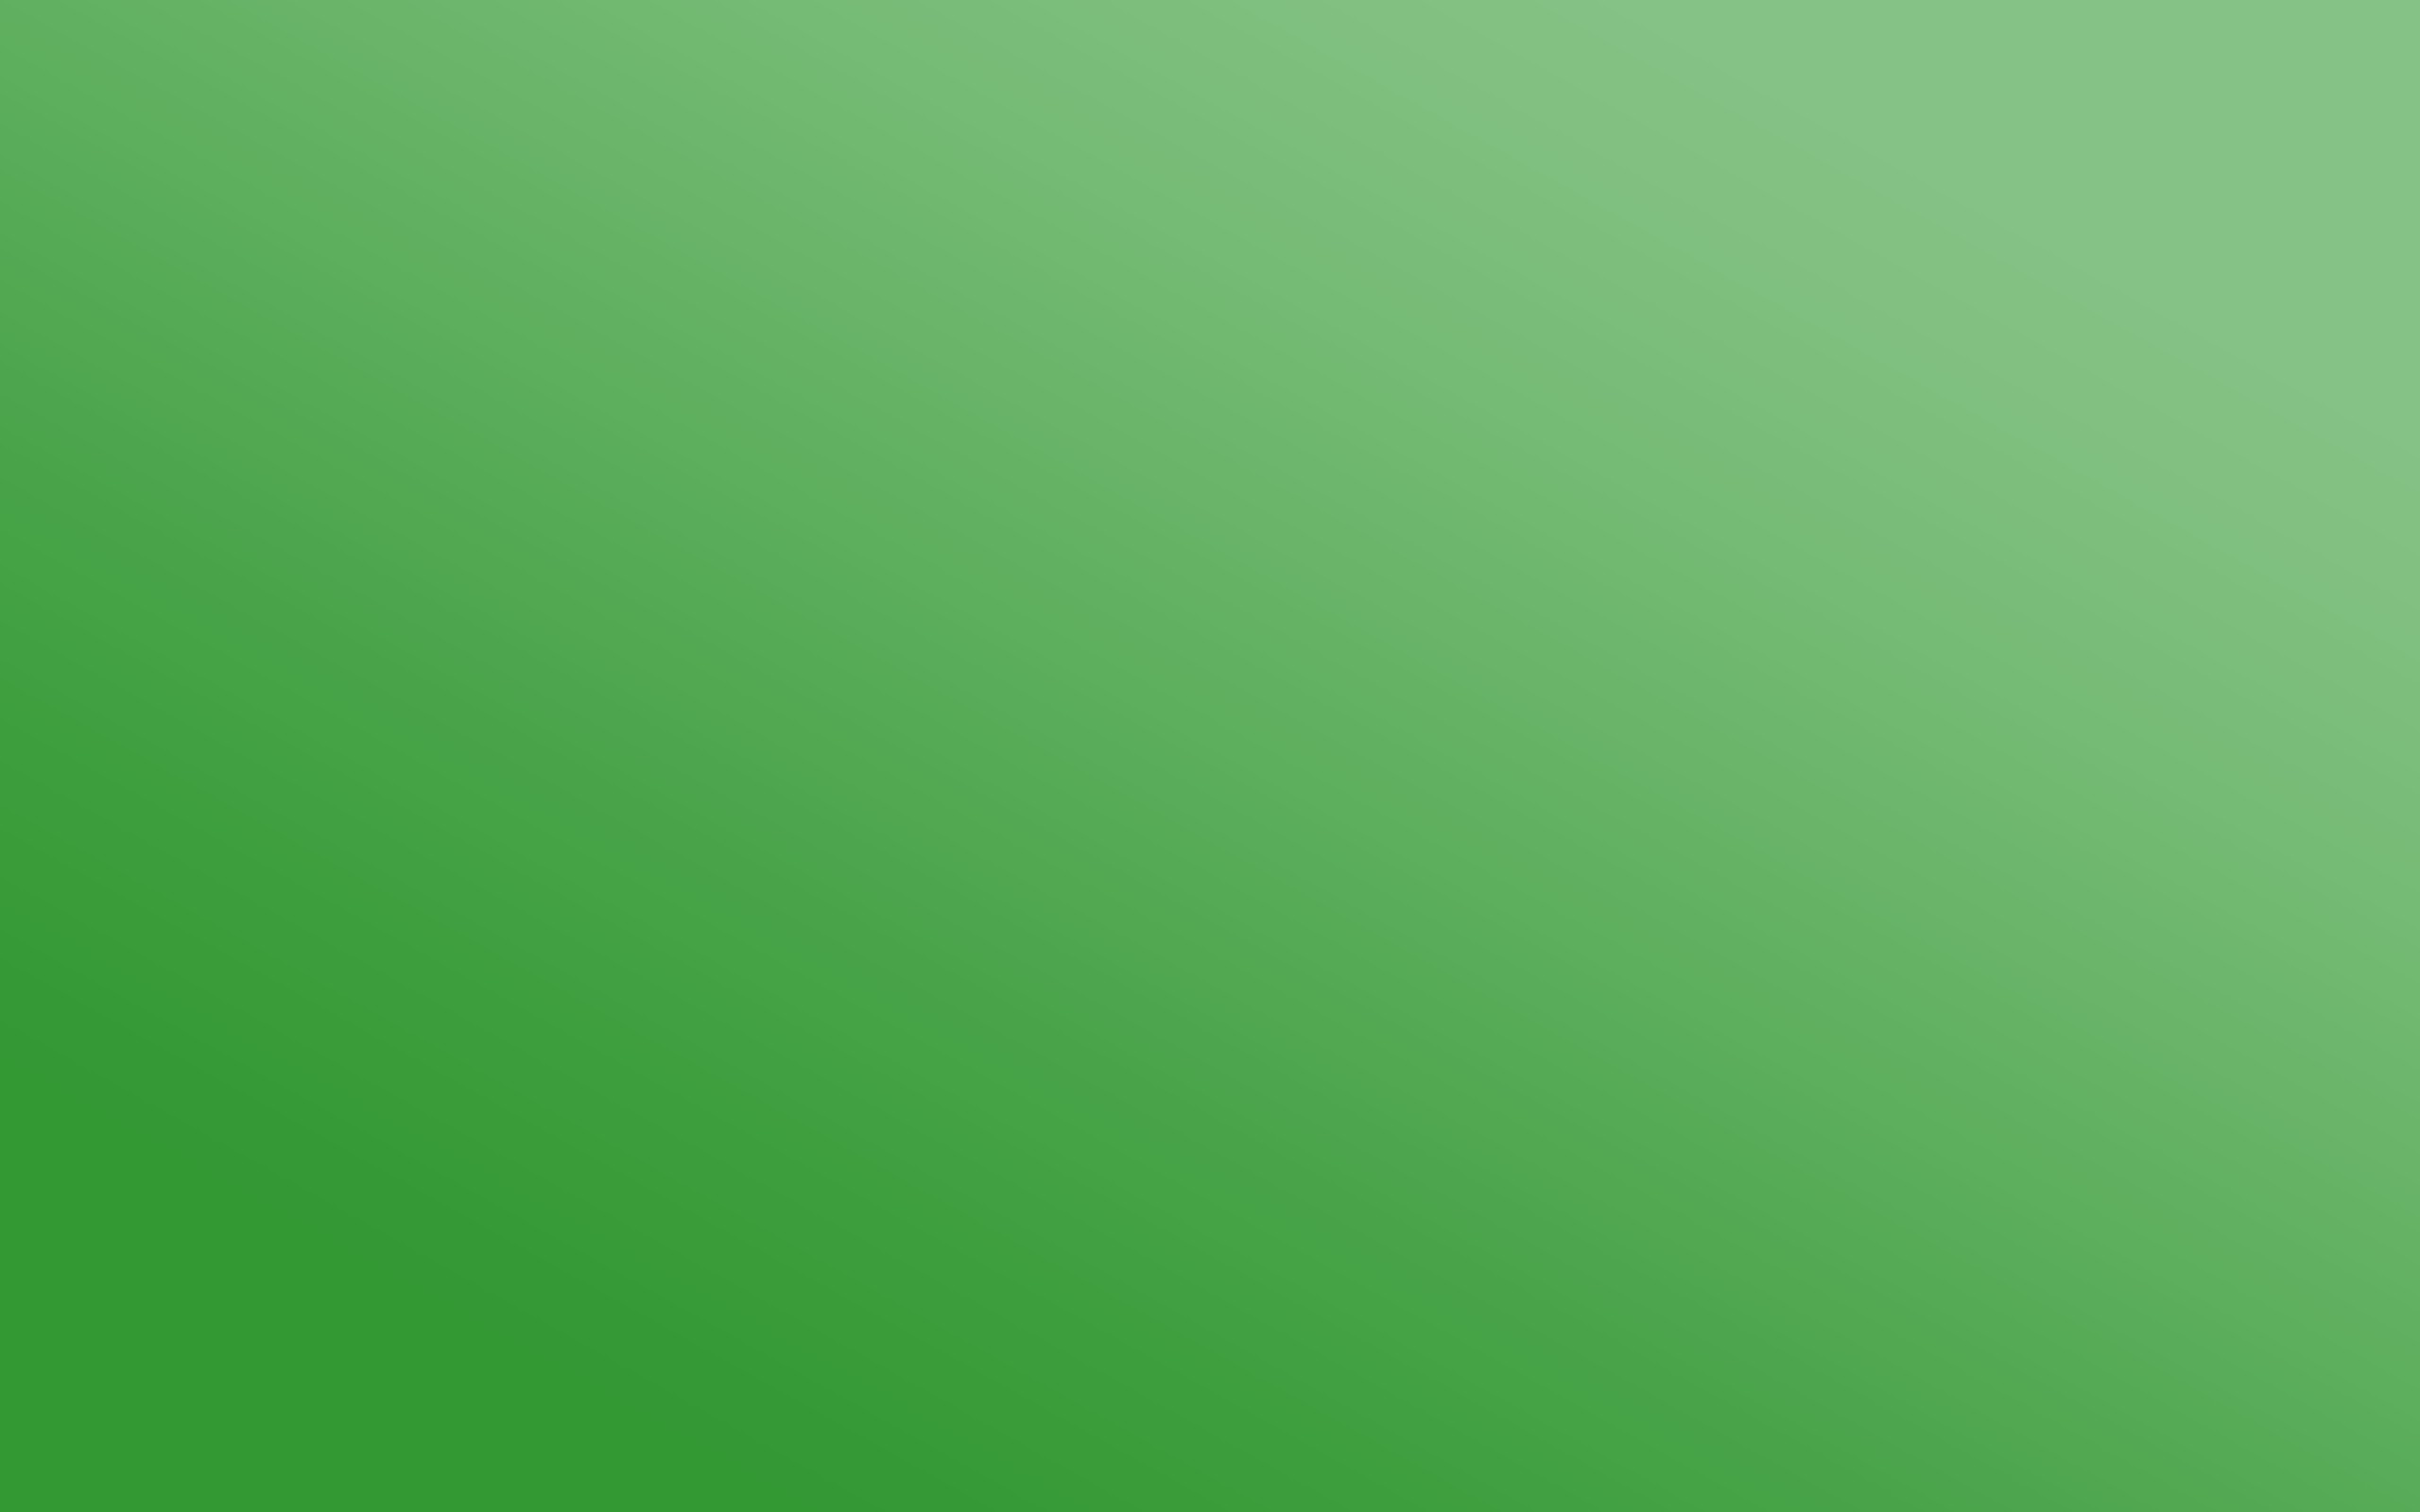 The Plain Color Green wallpaper